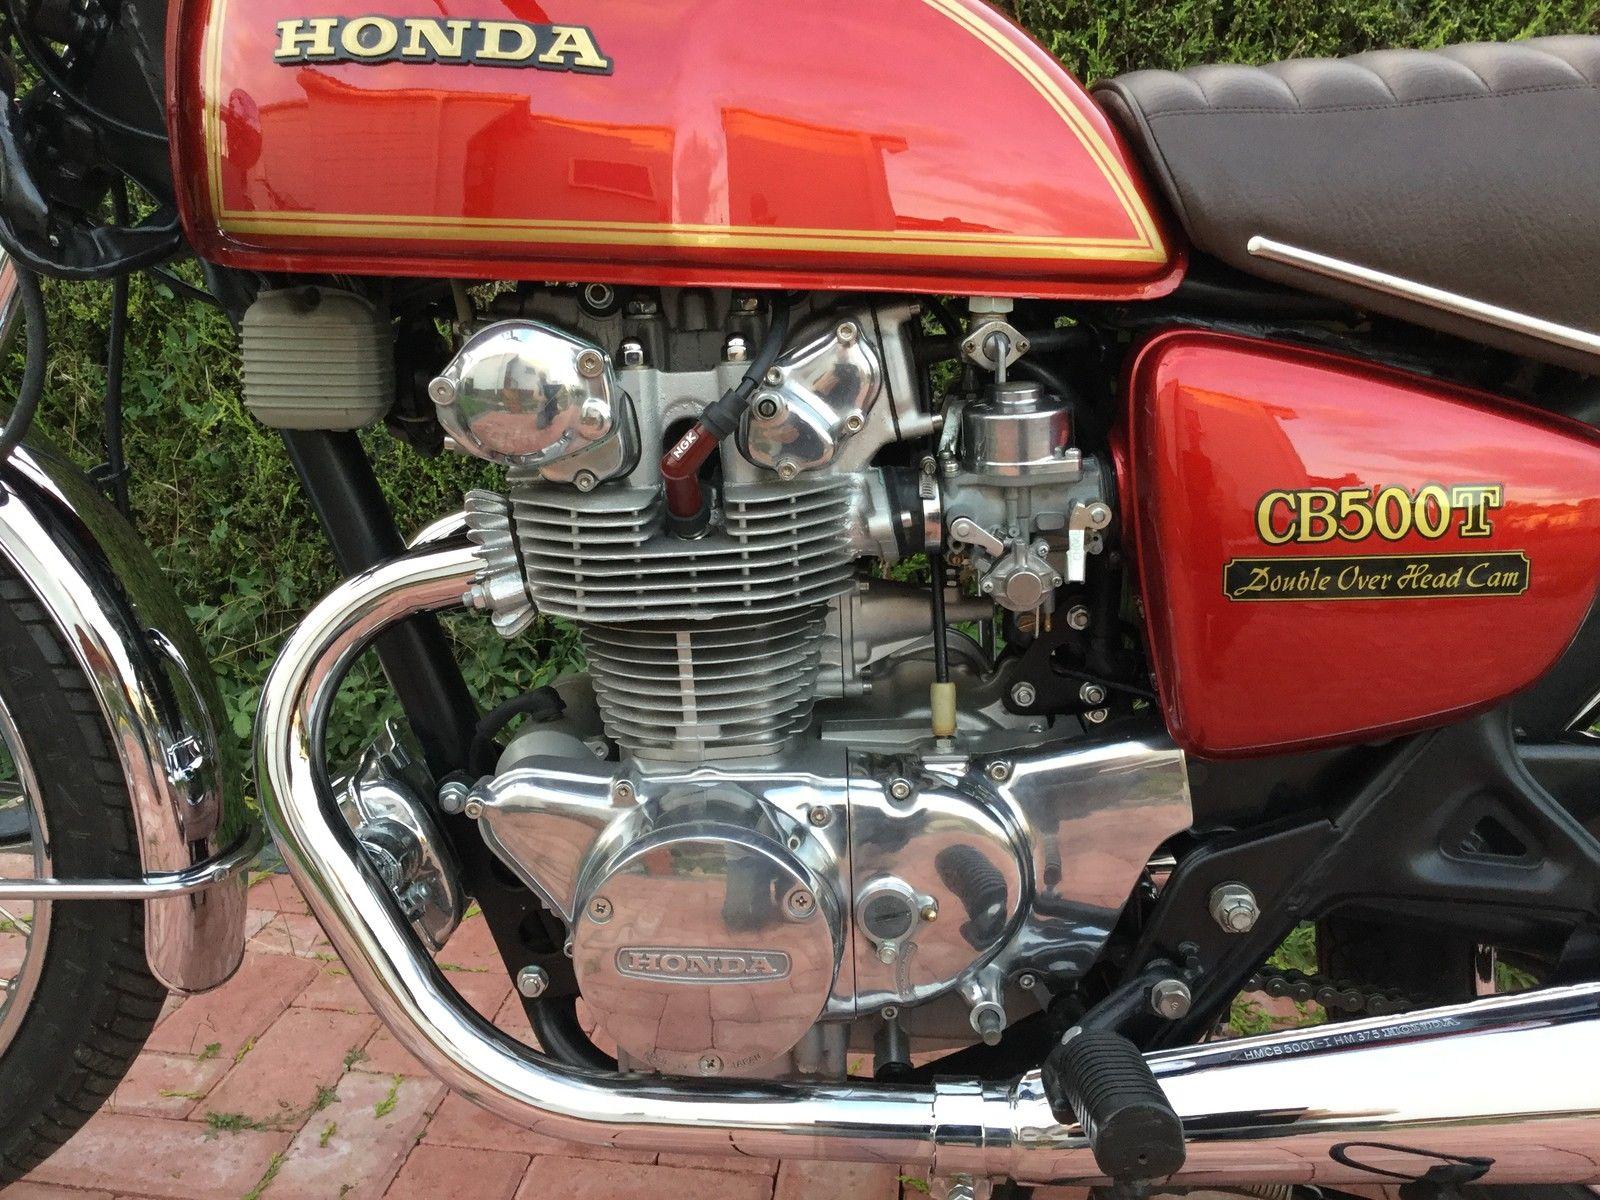 Honda CB500T - 1975